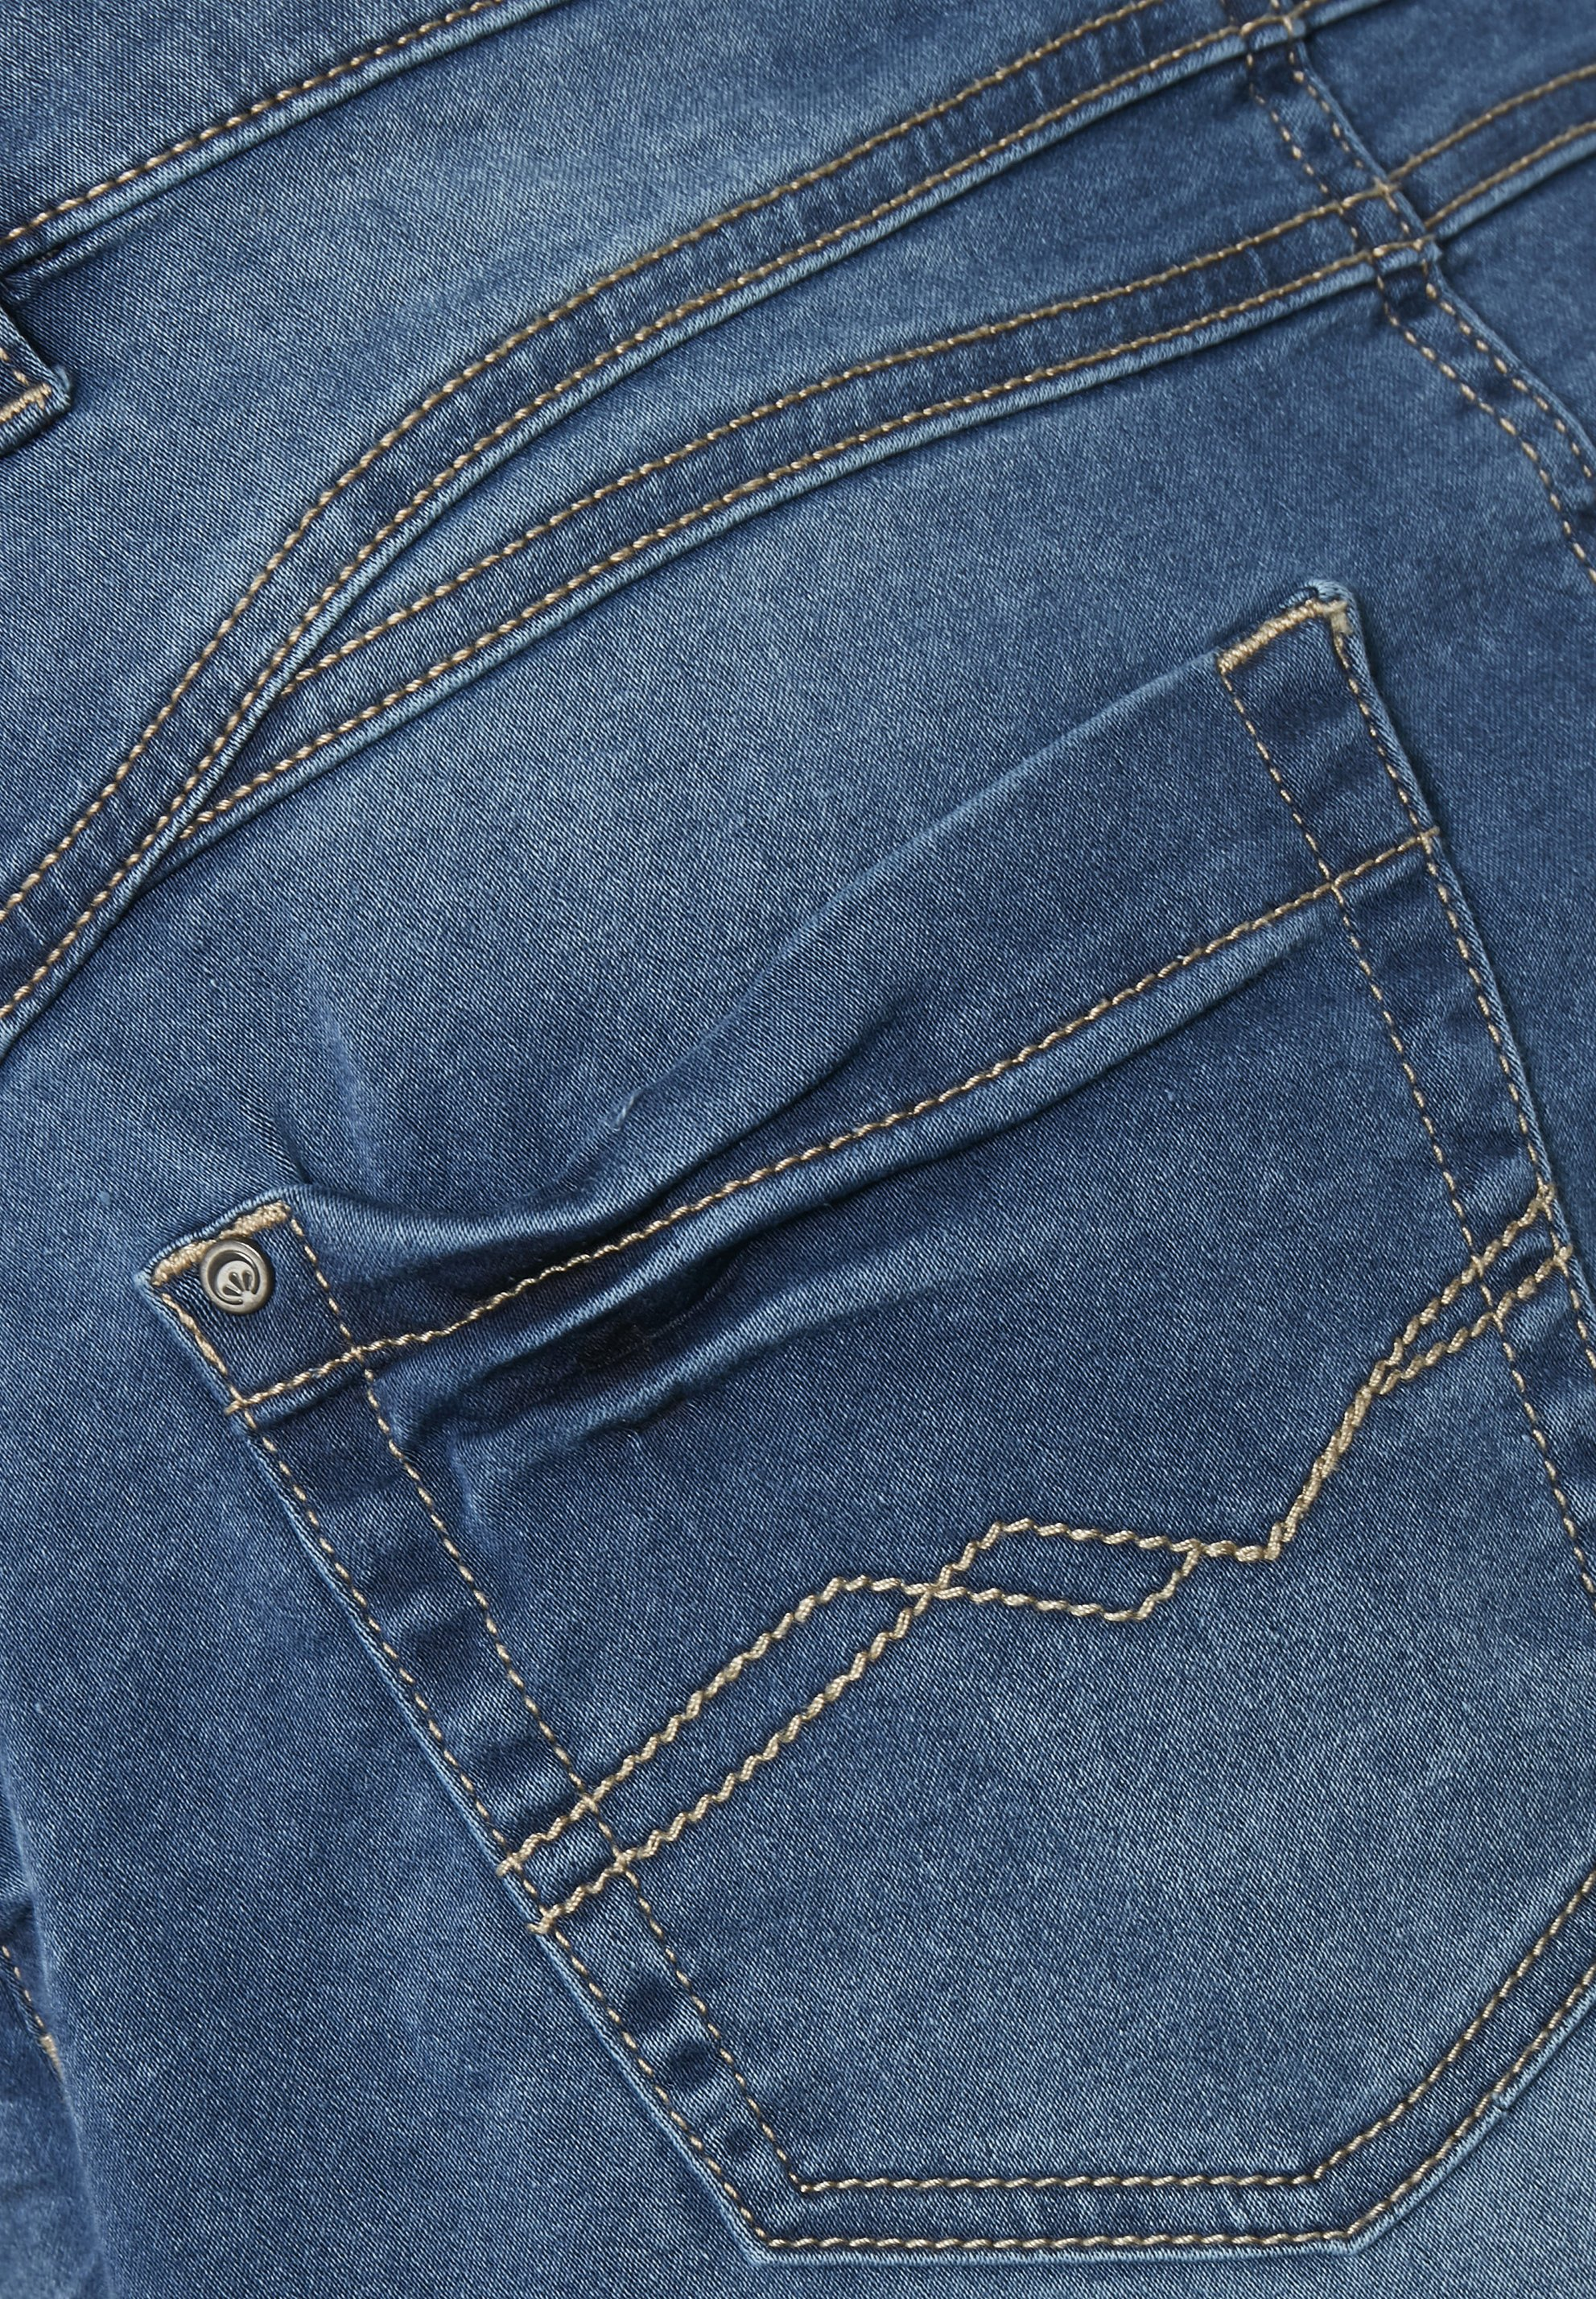 Cream CREAM SAMMYCR DENIM SKIRT - Denim skirt - rich blue denim - Women's Clothing 3lPfx